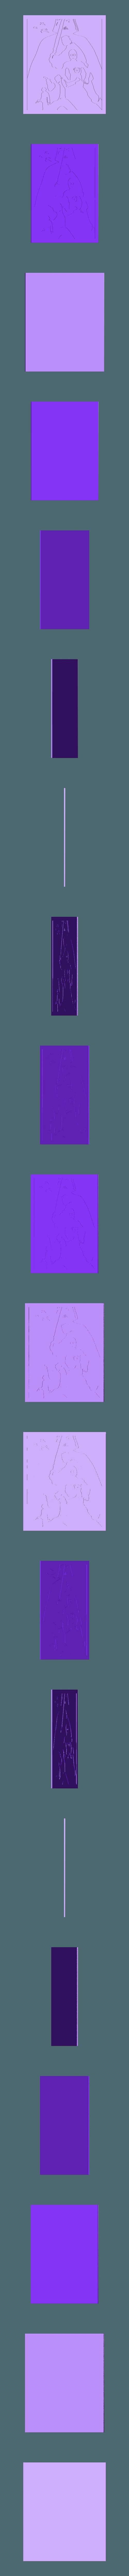 StarWars_darth_vader_-_luke_-_han_solo_-_leia_-_c3po_v1.stl Télécharger fichier STL gratuit darth vader - luke - han solo - leia - c3po • Objet imprimable en 3D, yb__magiic